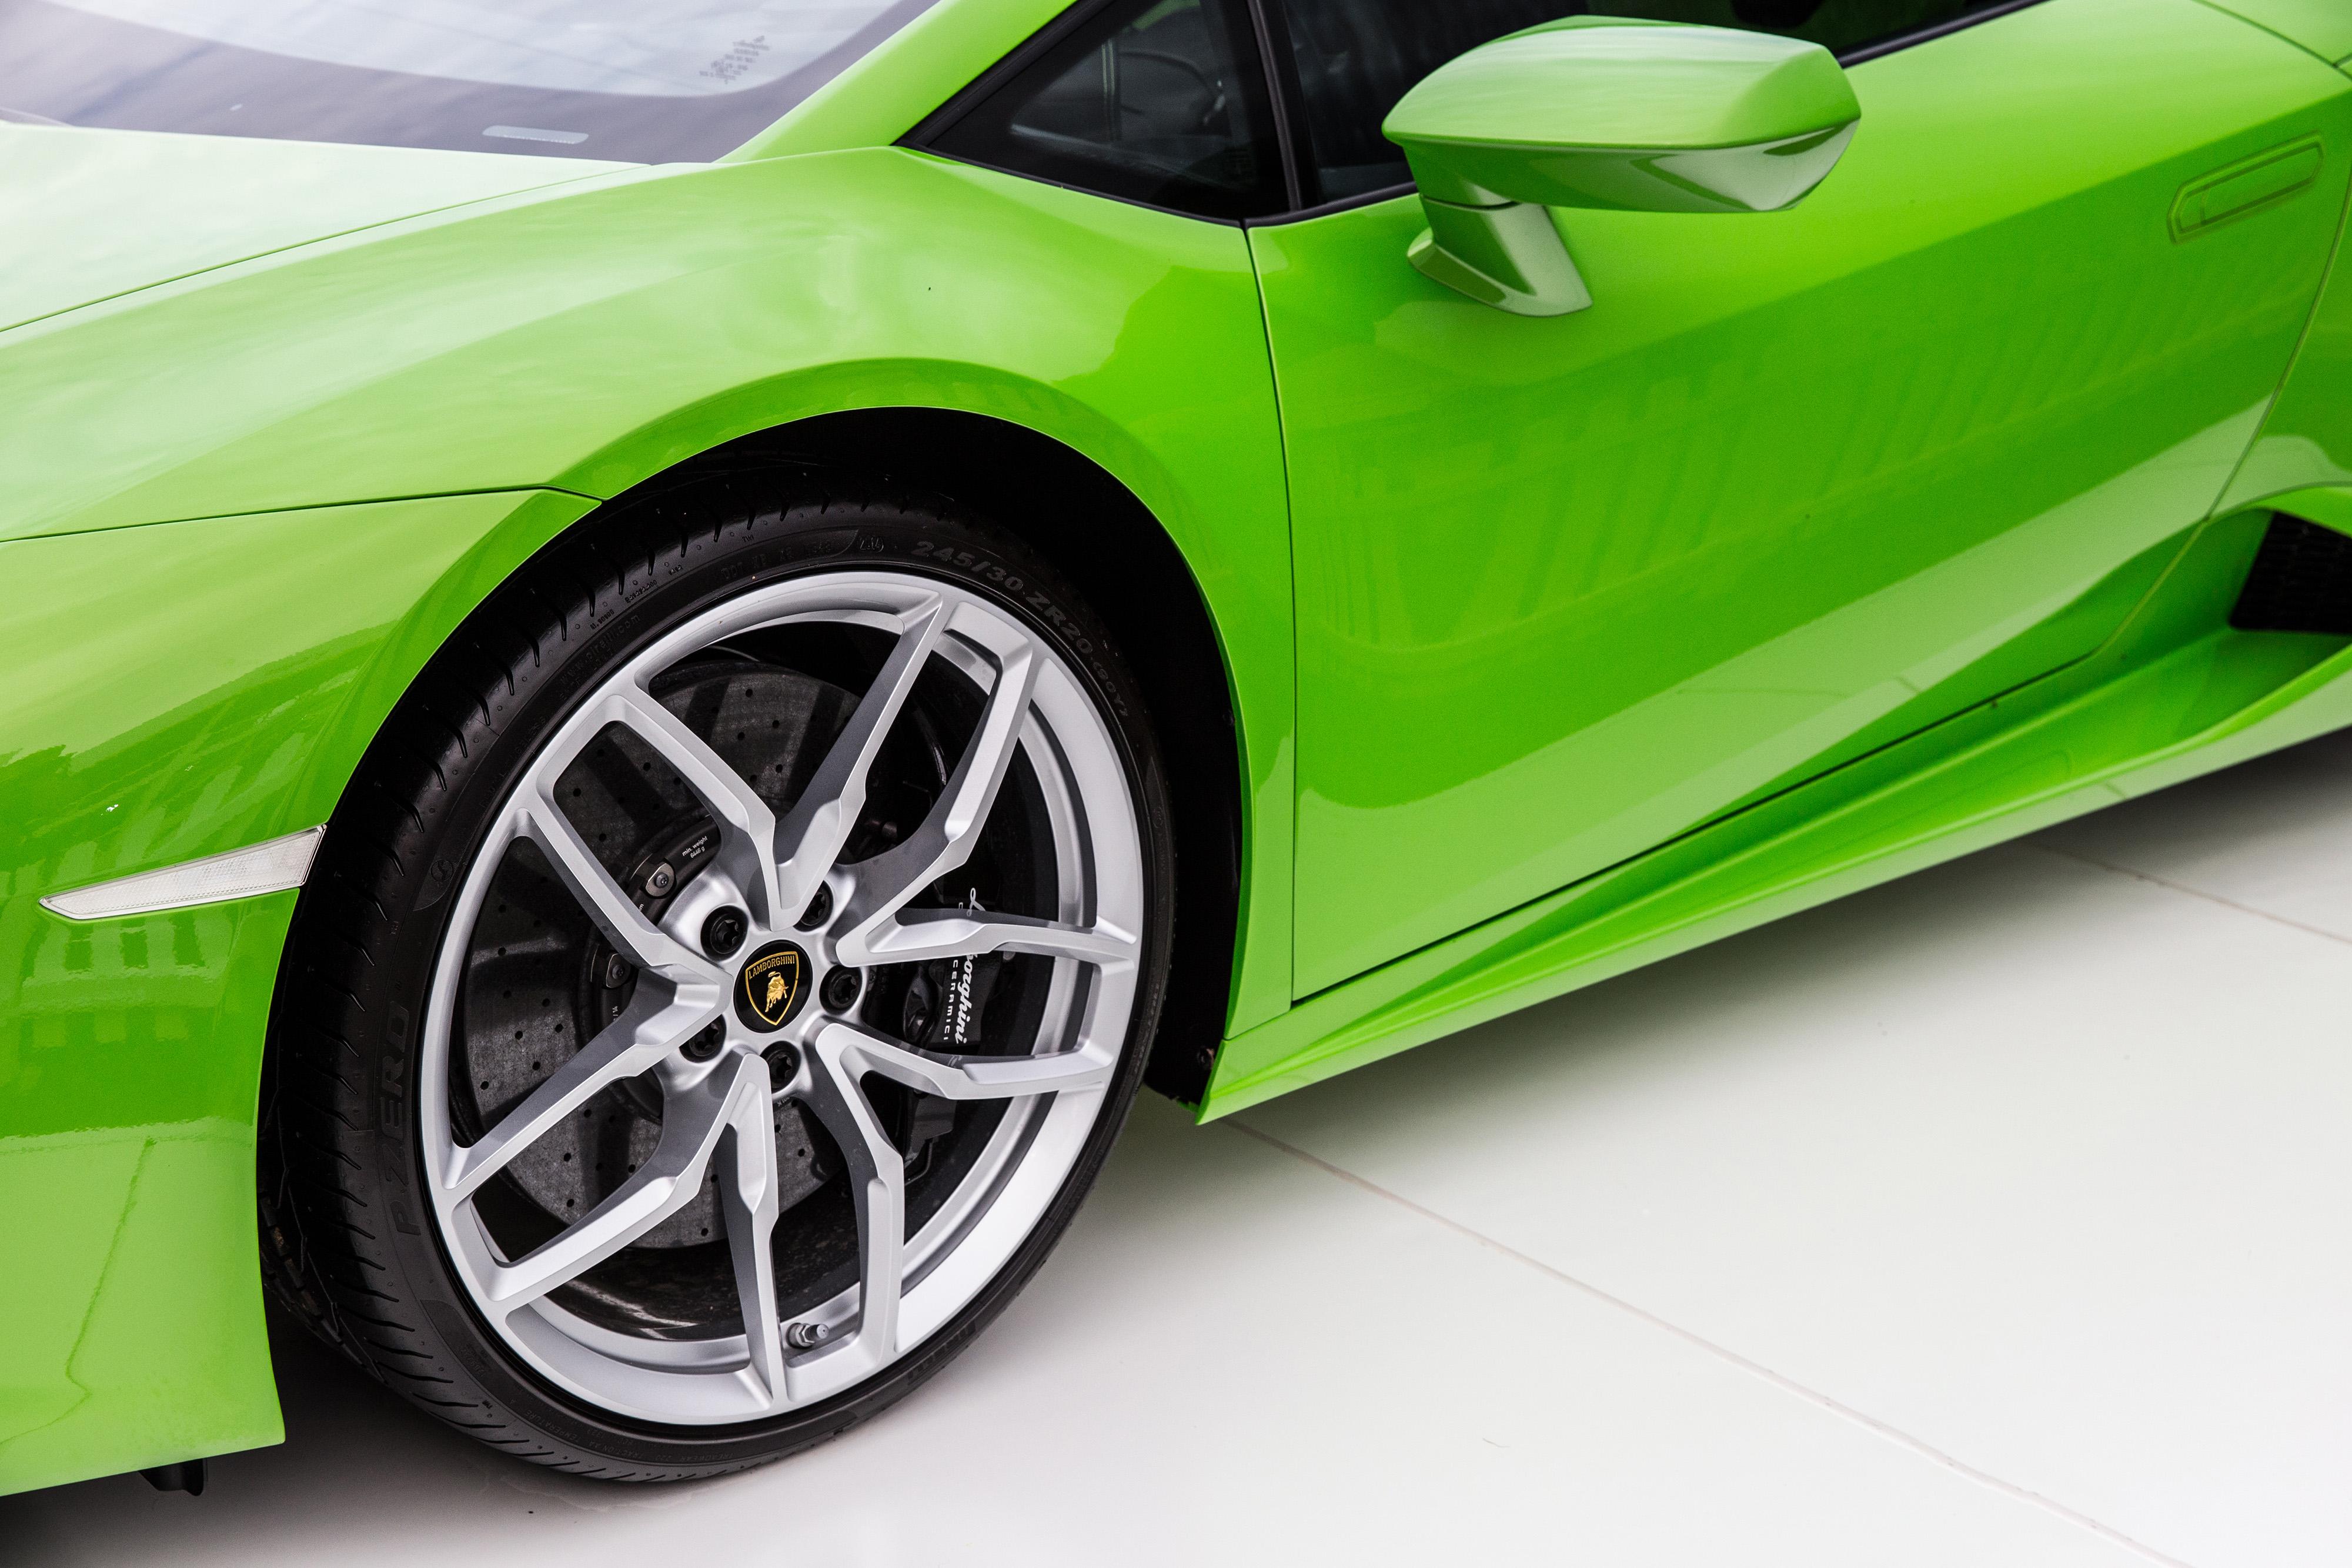 120837 Заставки и Обои Ламборджини (Lamborghini) на телефон. Скачать Ламборджини (Lamborghini), Тачки (Cars), Зеленый, Колесо, Дверь картинки бесплатно